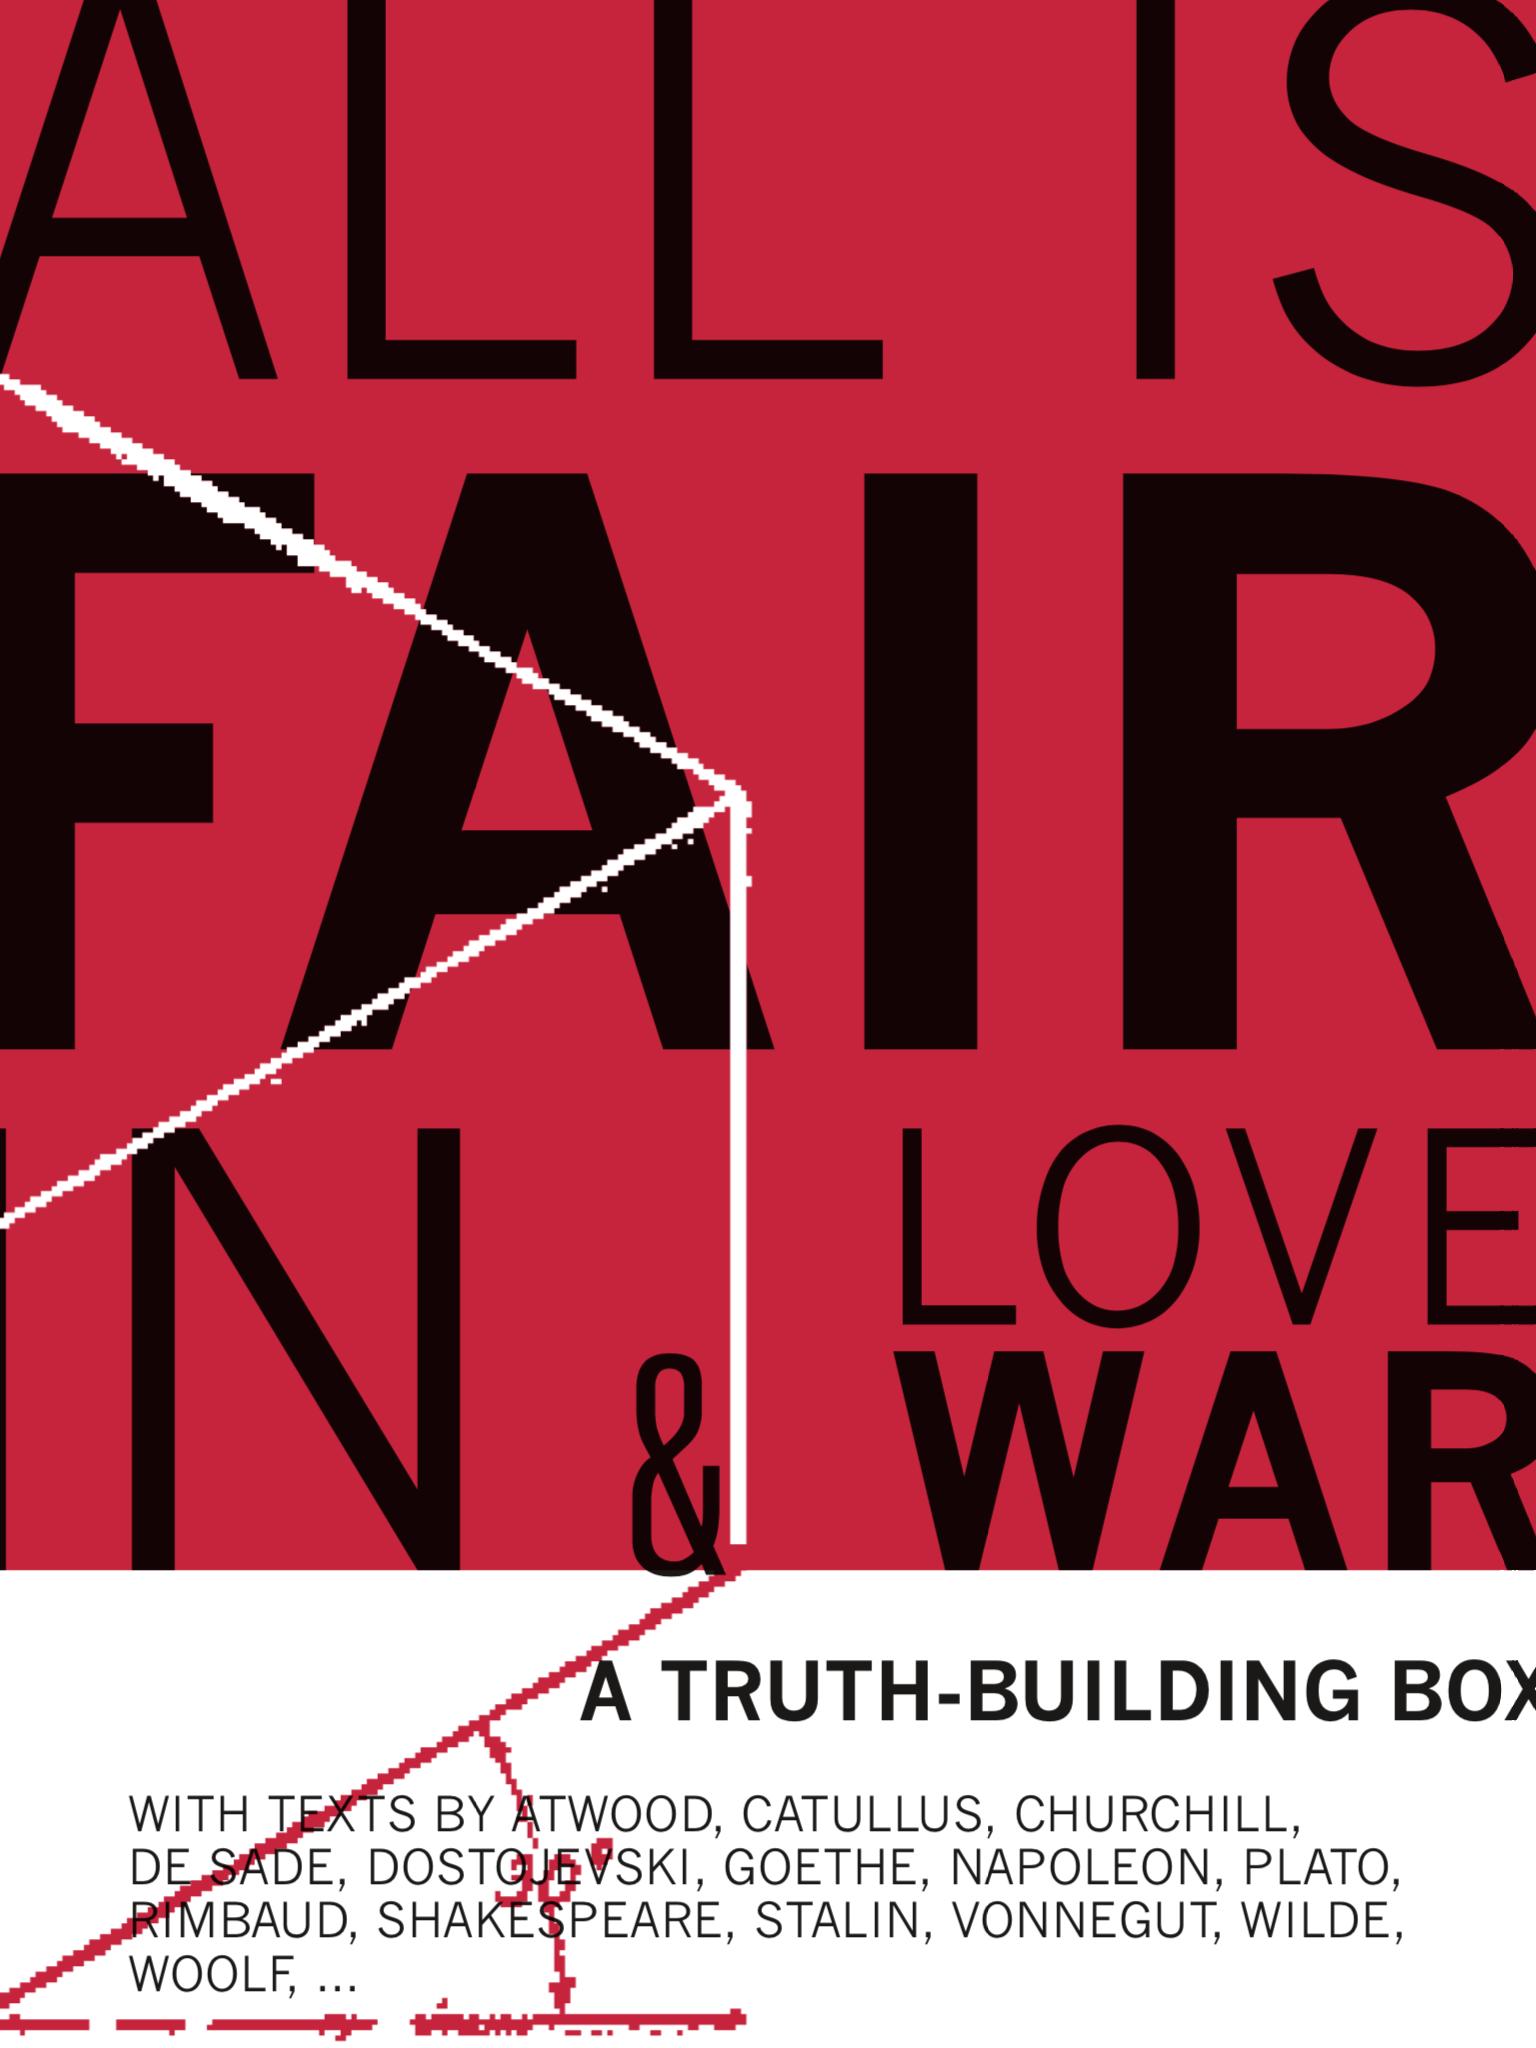 all is fair (in love & war) – muziektheater – 2019 (#multilingual)